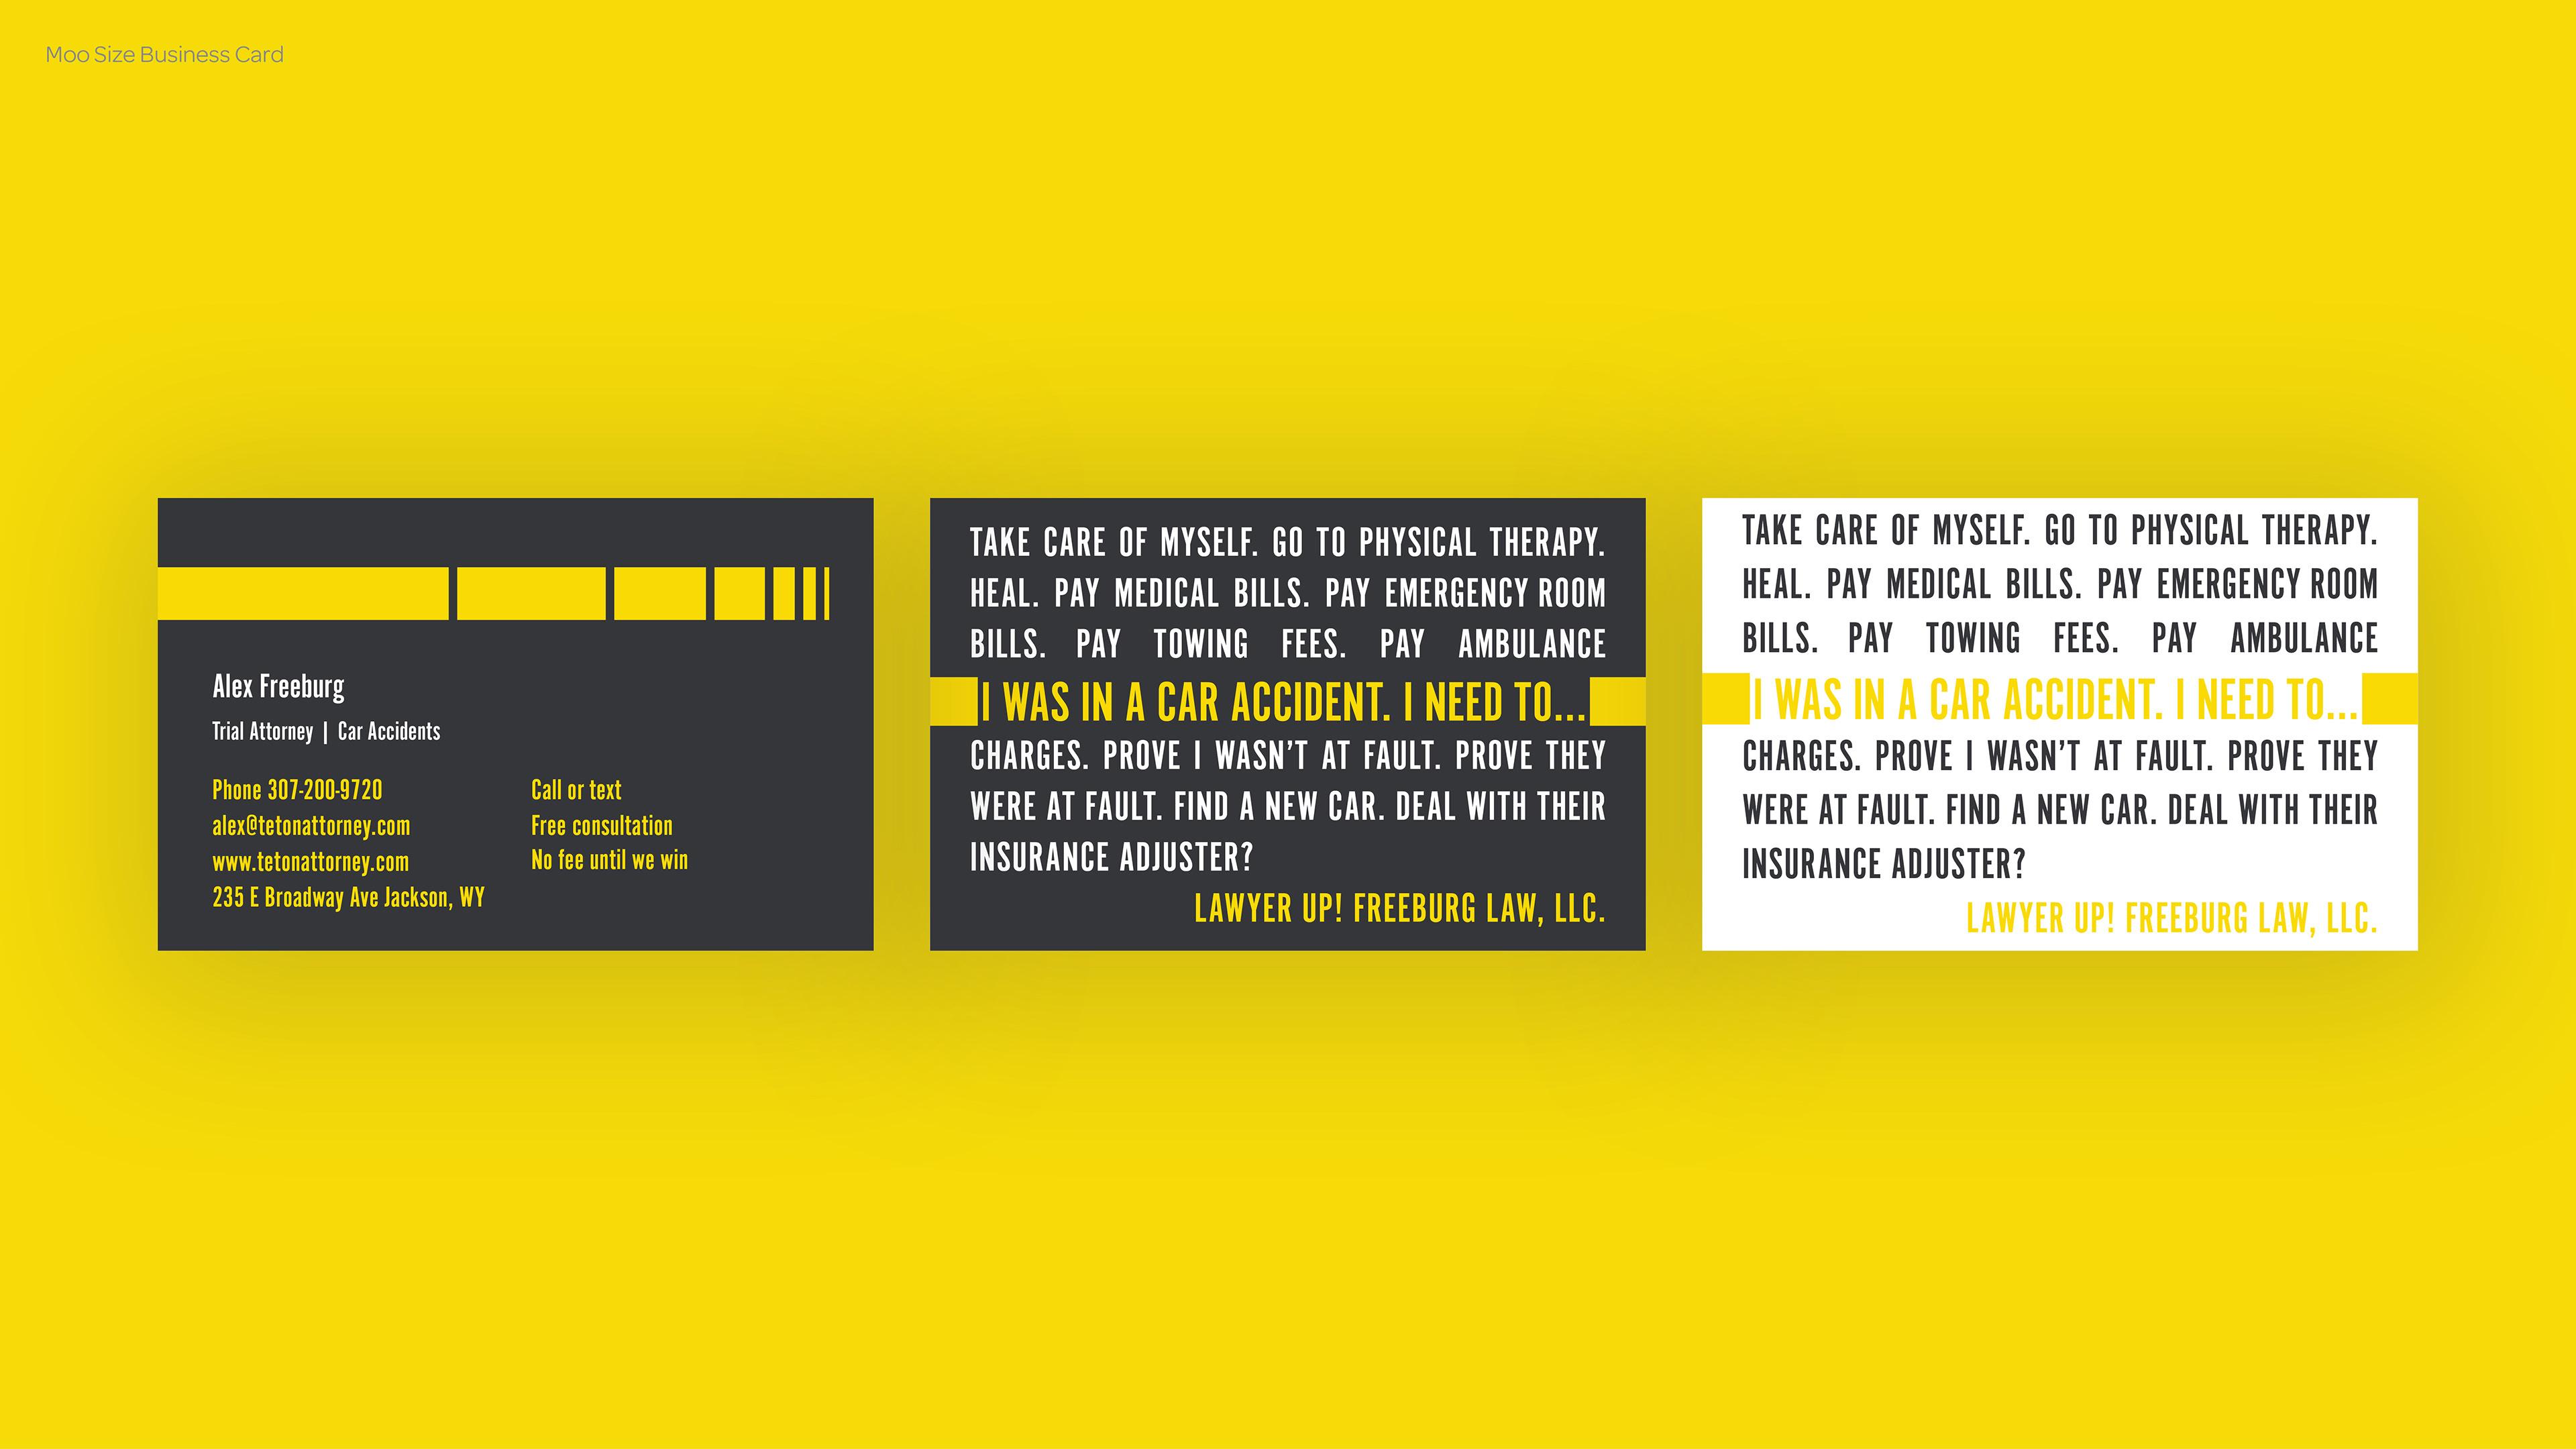 Keren Kraus Web & Visual Designer - Business Cards